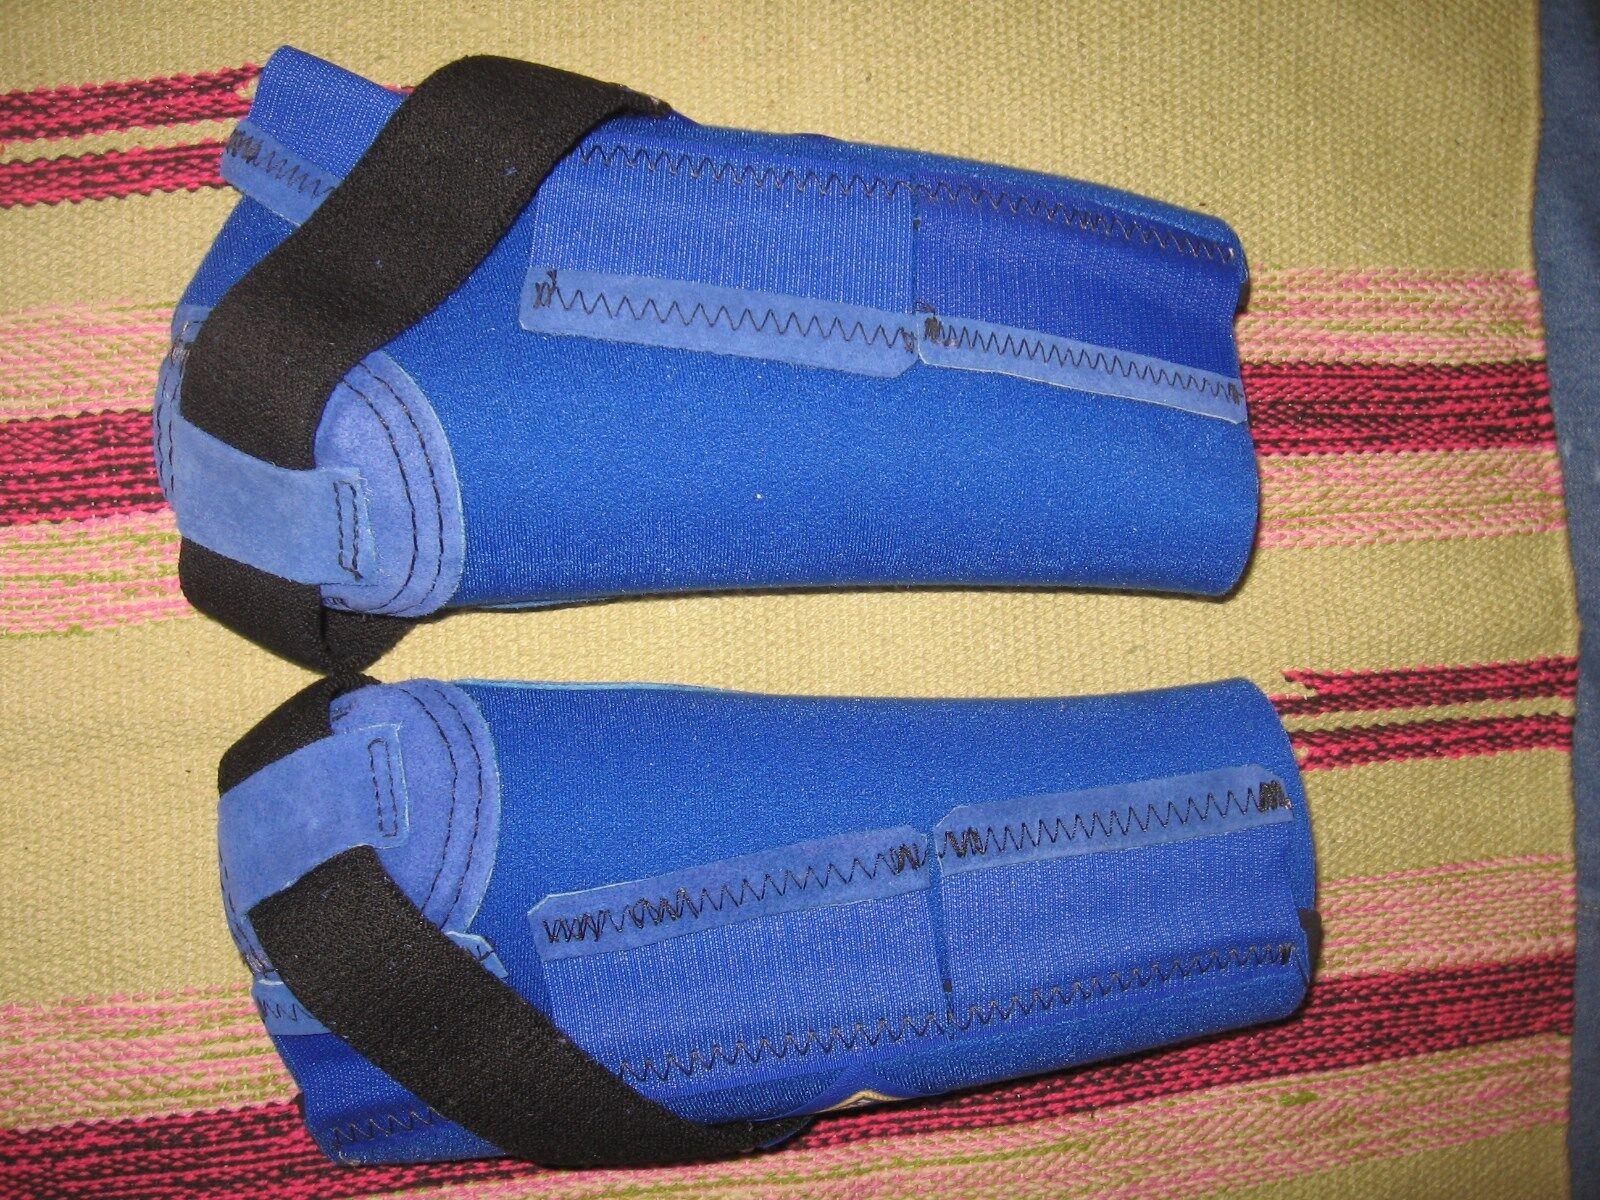 Nuevo Par Bar F productos Azul M-Pact Caballo Stealth botas medio frontal B-715